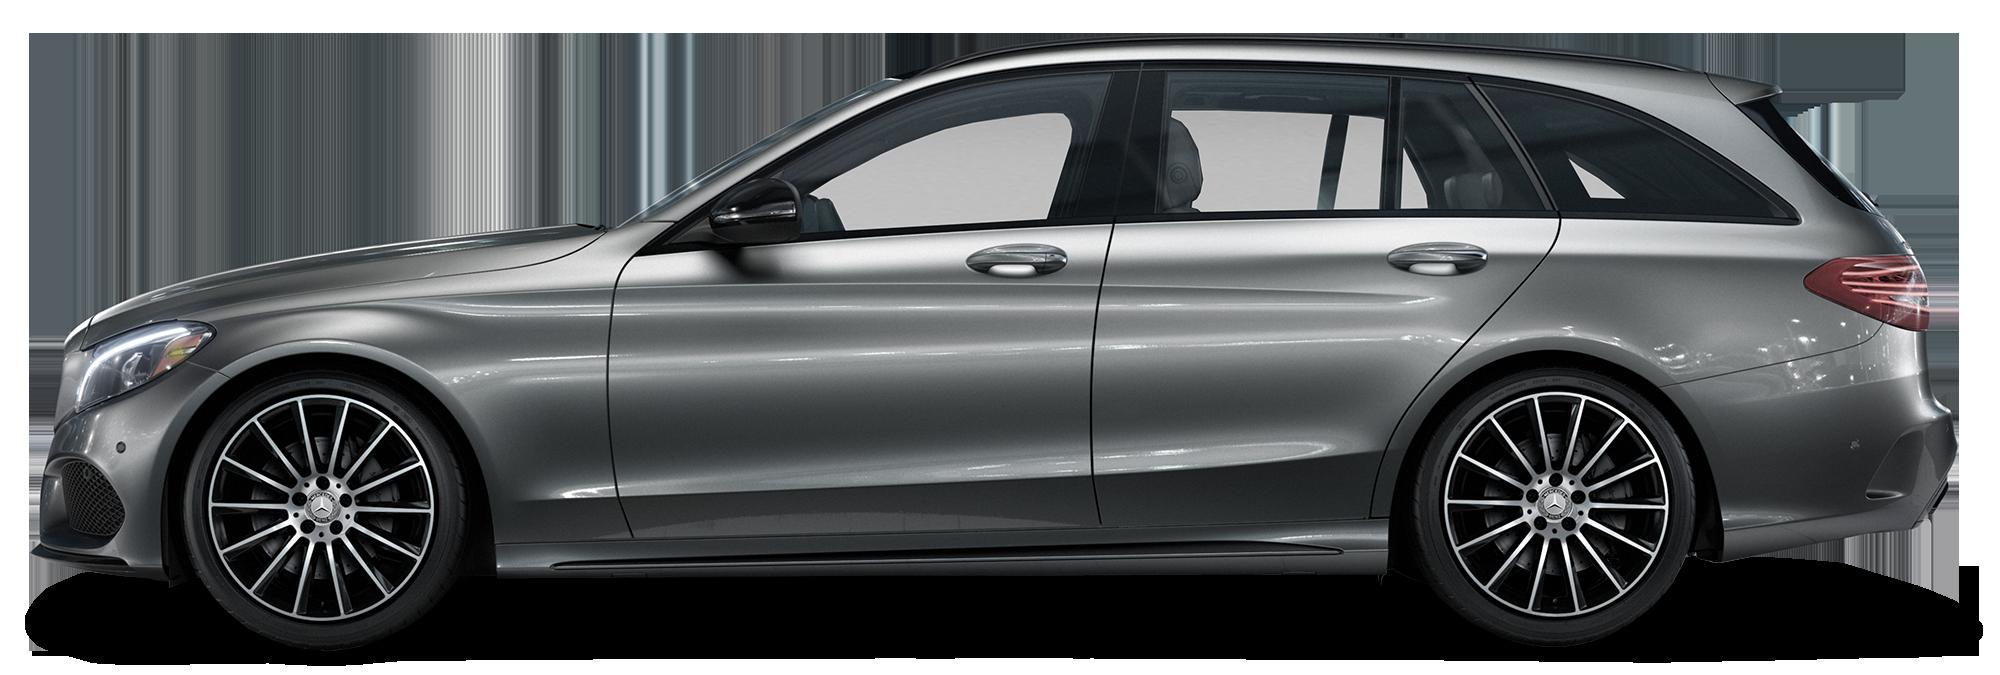 2018 Mercedes-Benz Classe C Wagon 4MATIC